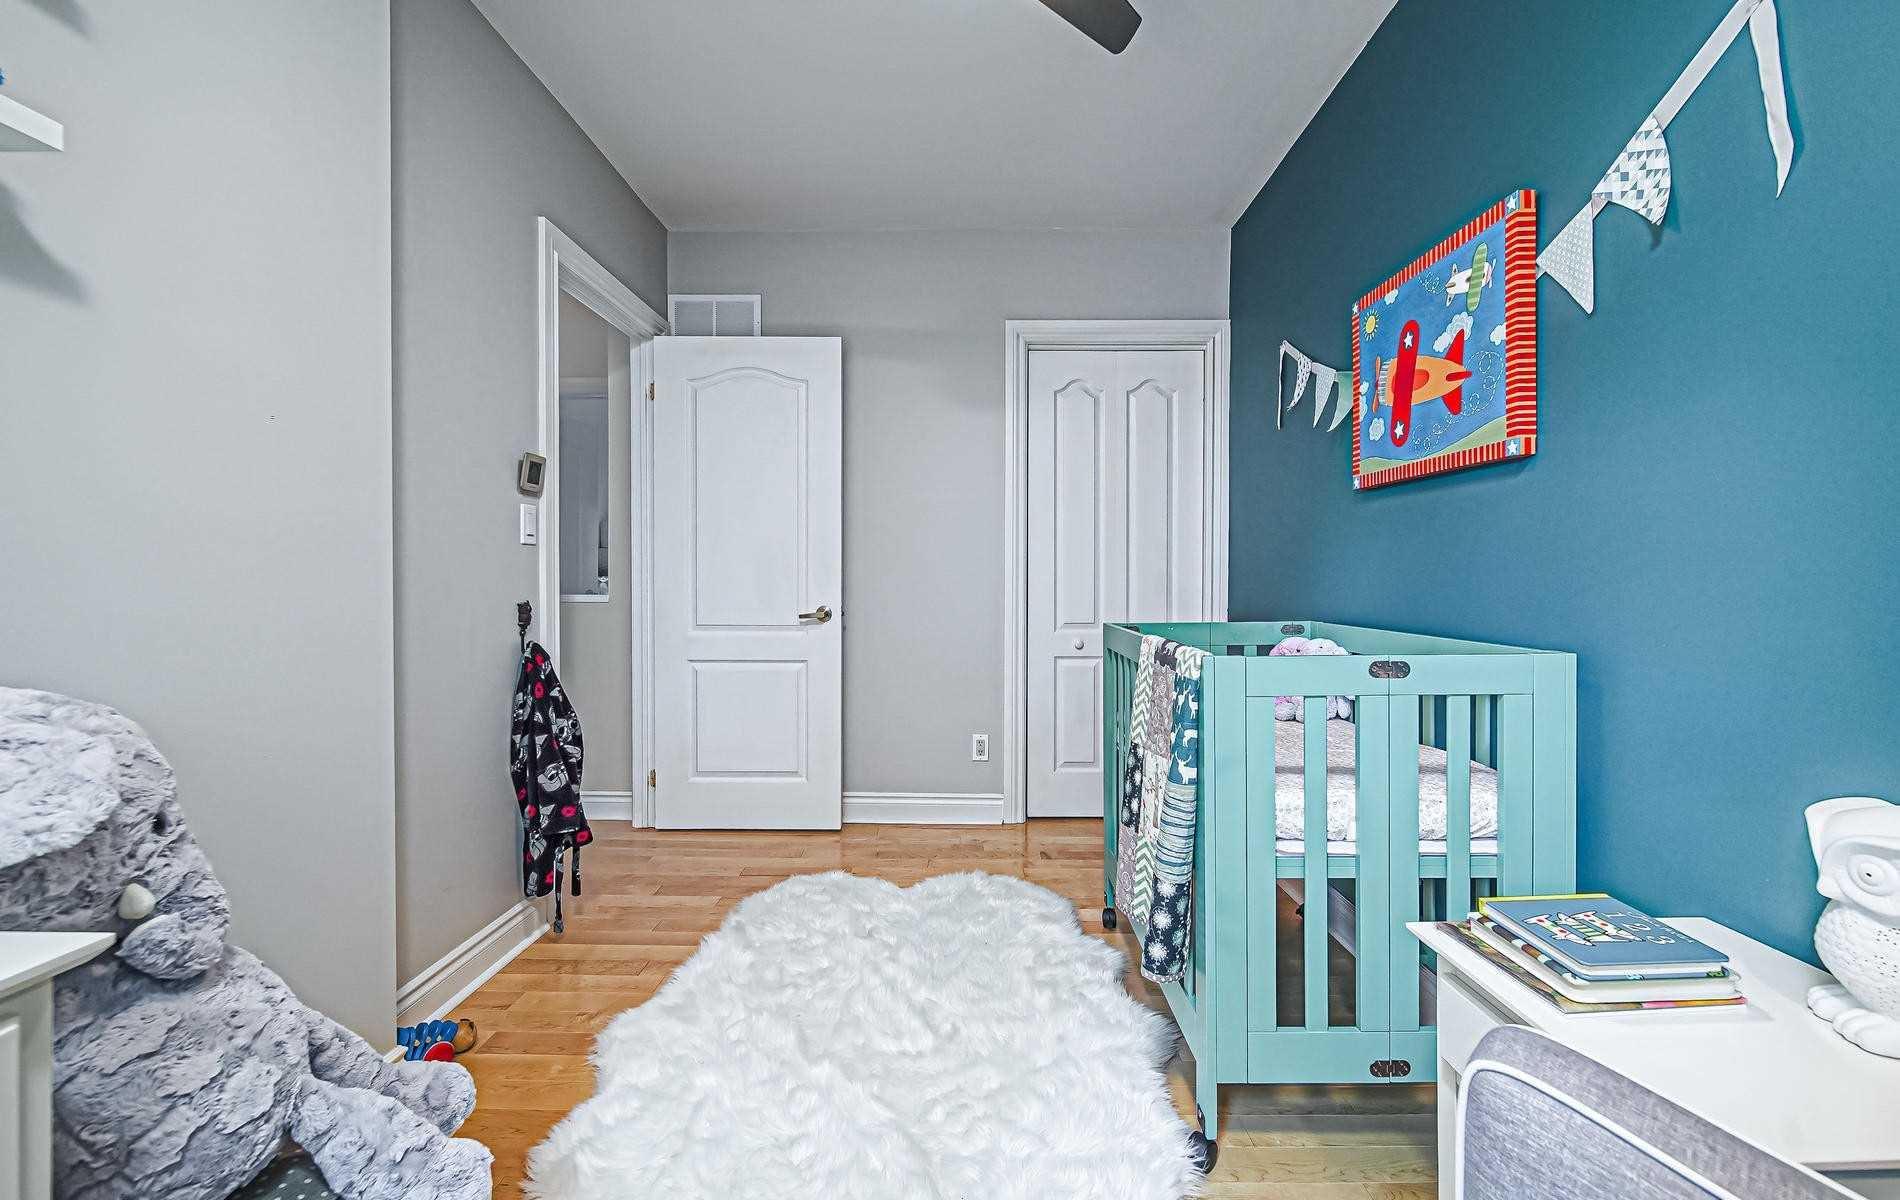 Photo 13: Photos: 84 Rushbrooke Avenue in Toronto: South Riverdale House (2-Storey) for sale (Toronto E01)  : MLS®# E4600791